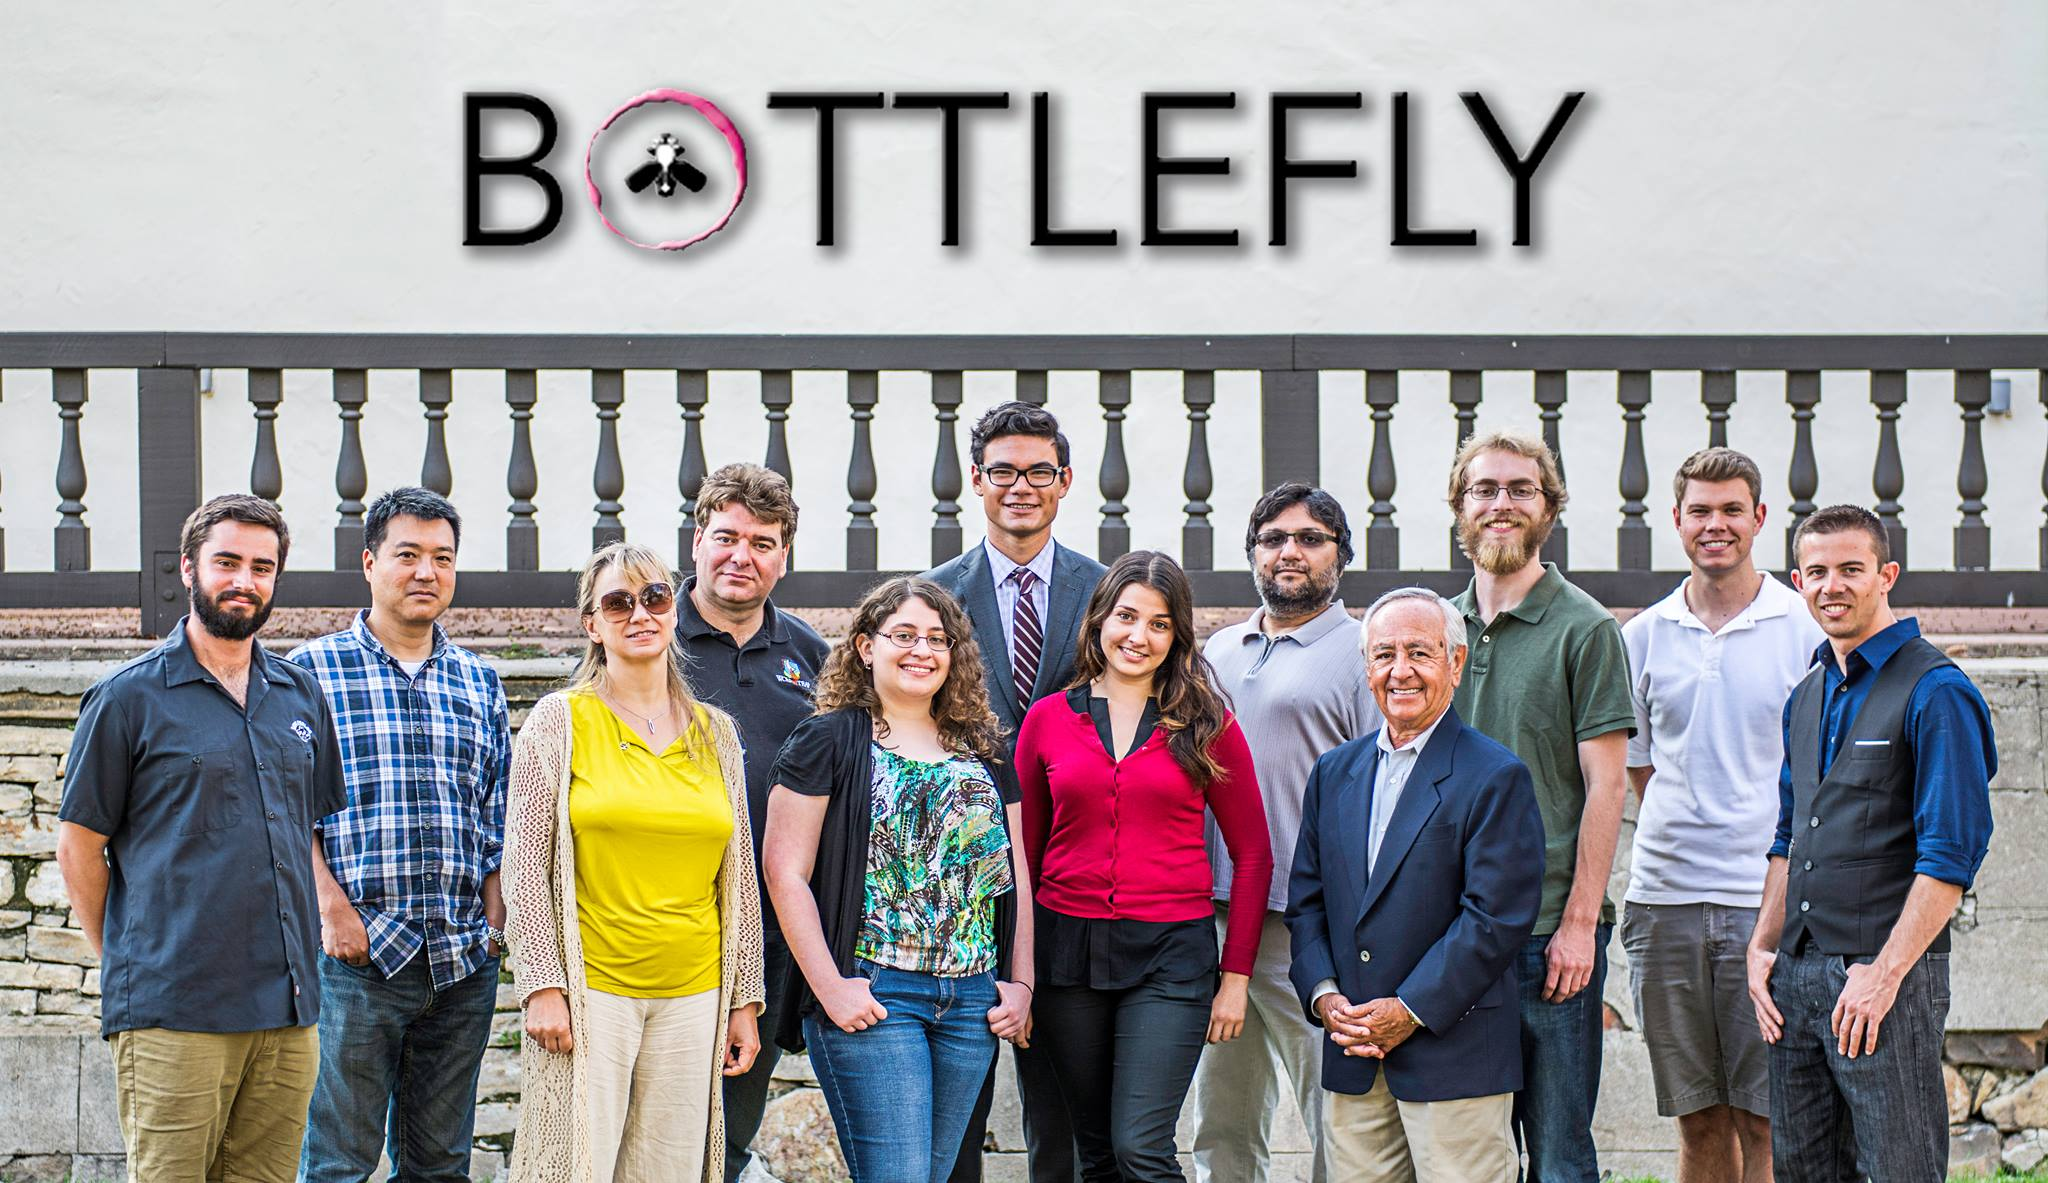 Bottlefly team (from left to right): Benjamin Aldrich, Toshi Kuboi, Olga Dekhtyar, Alex Dekhtyar, Nicole Martin, Evan Lanuza, Katerina Axelsson, Foaad Khosmood, Dennis Fernandez, Brian Jones, Eric Thorndyke, Timothy Scott.